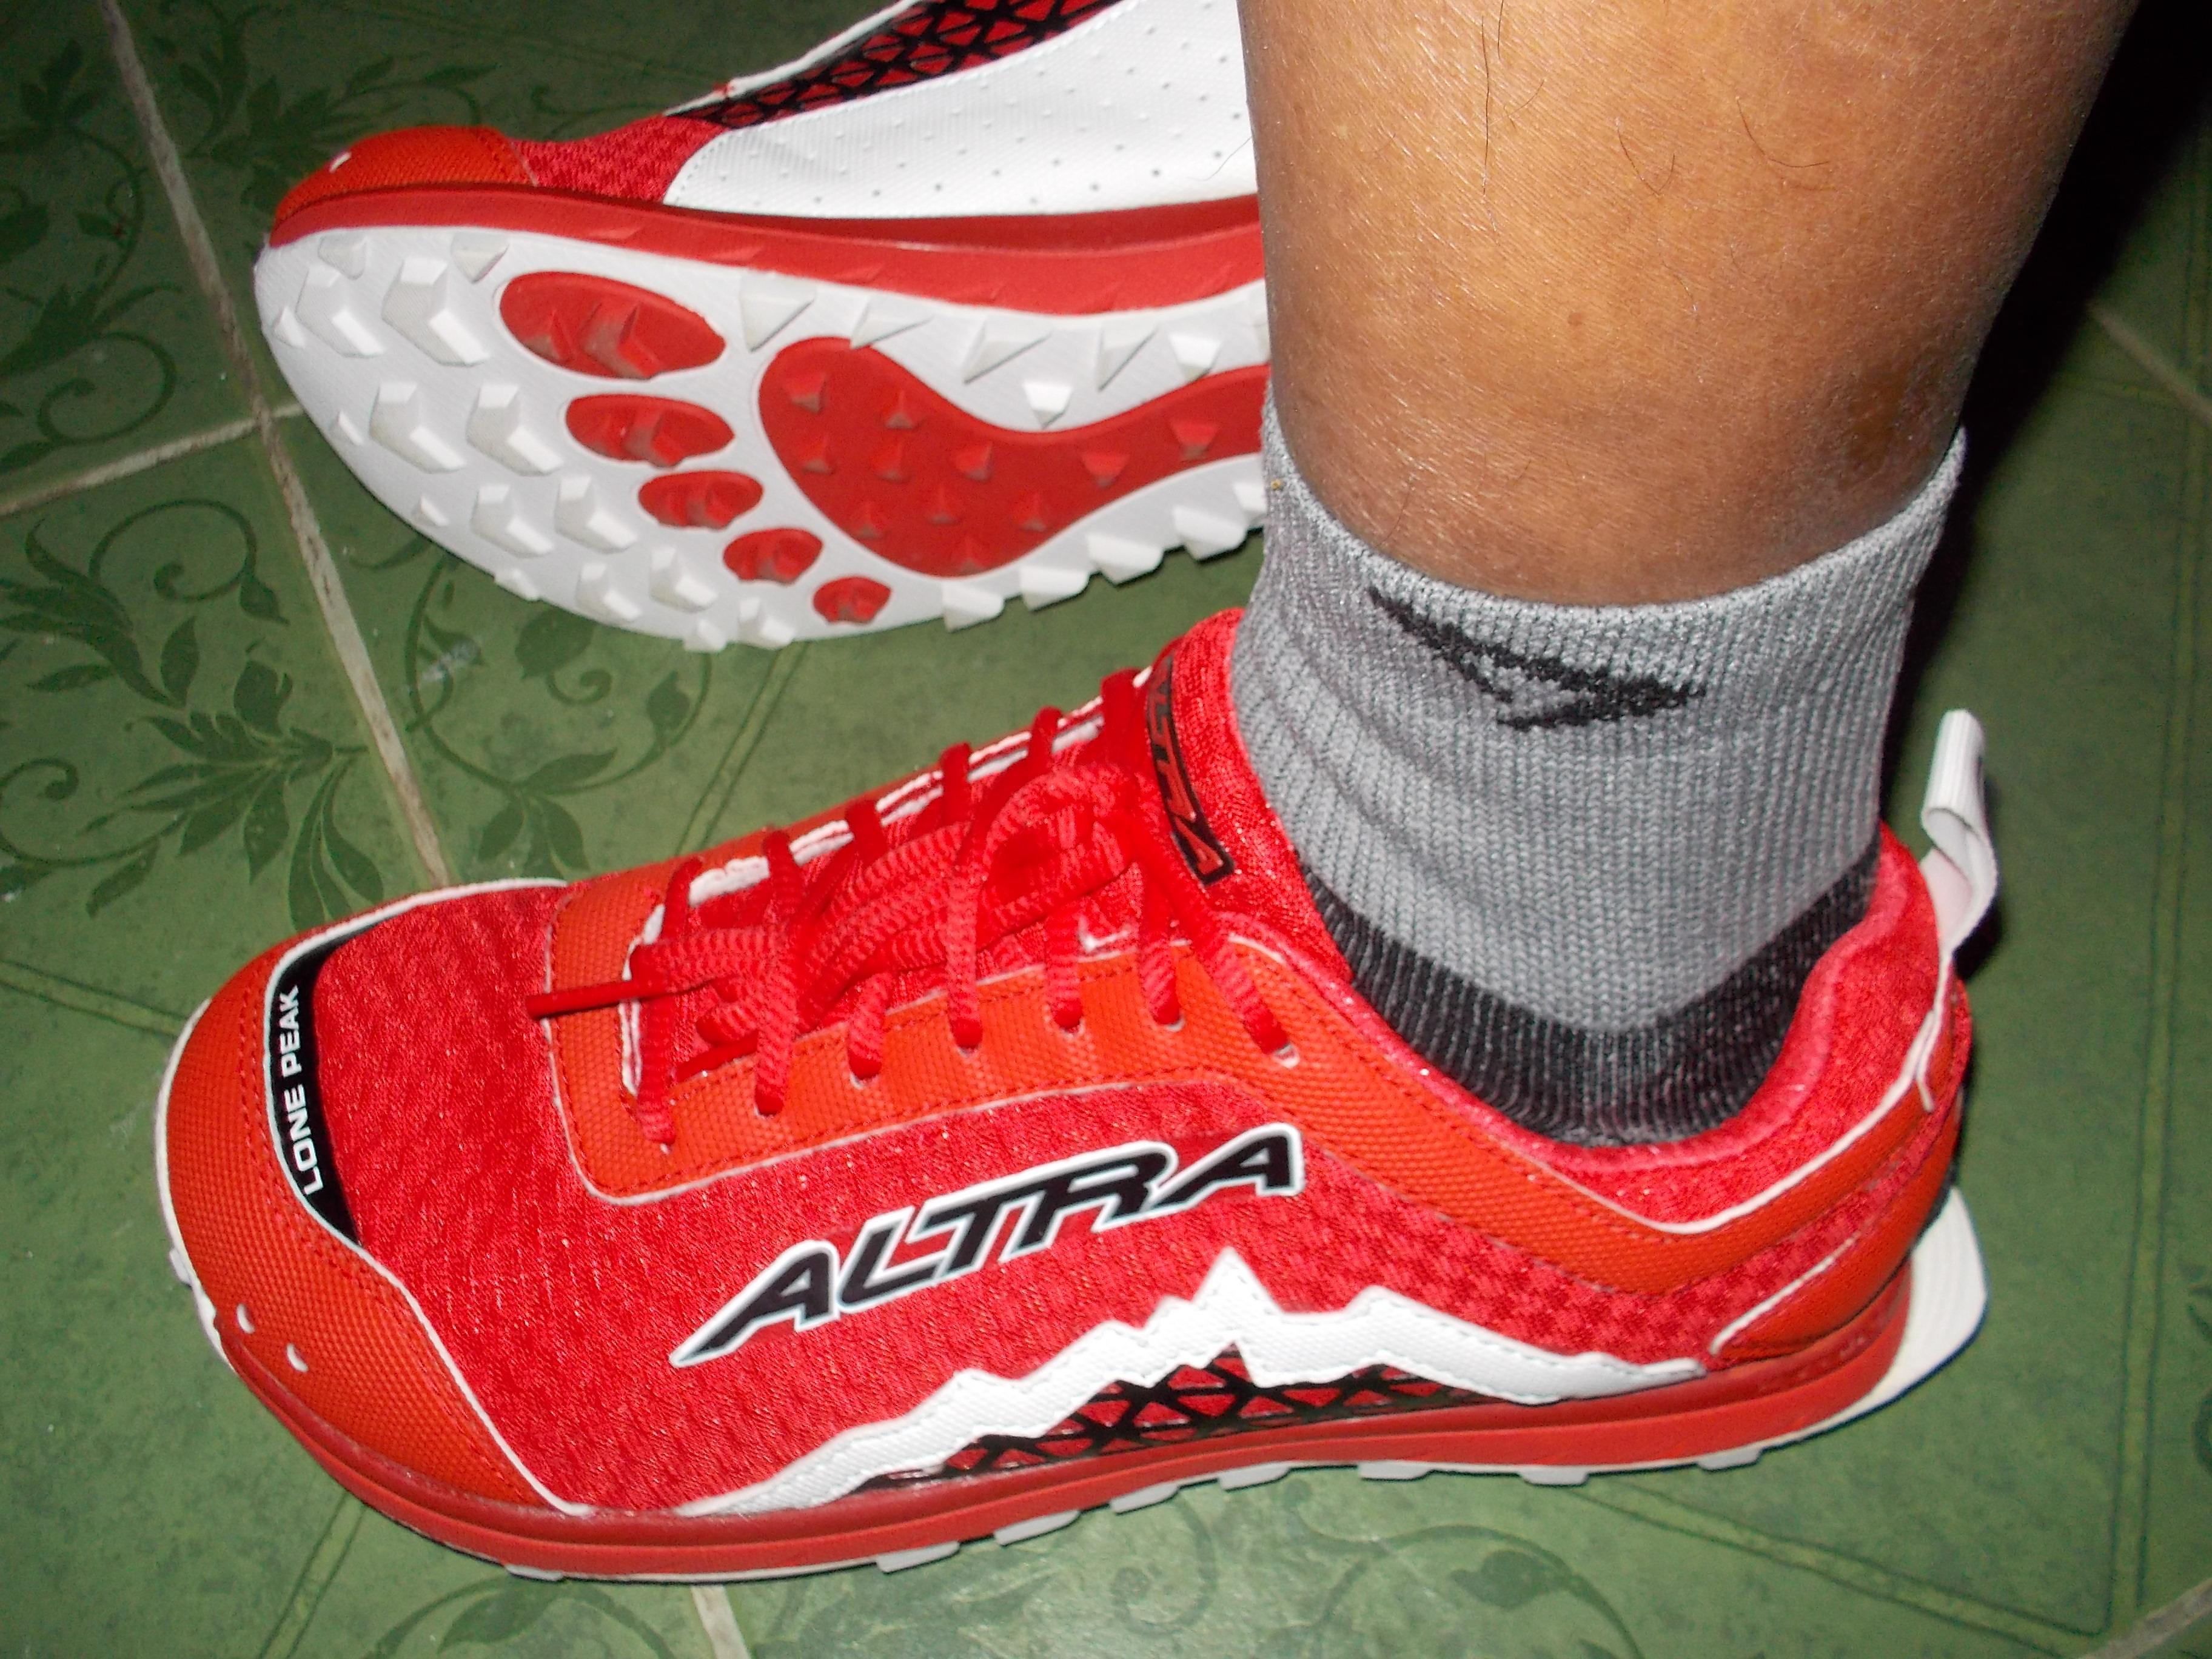 Shoe Review: ALTRA Lone Peak 1.5 | Bald